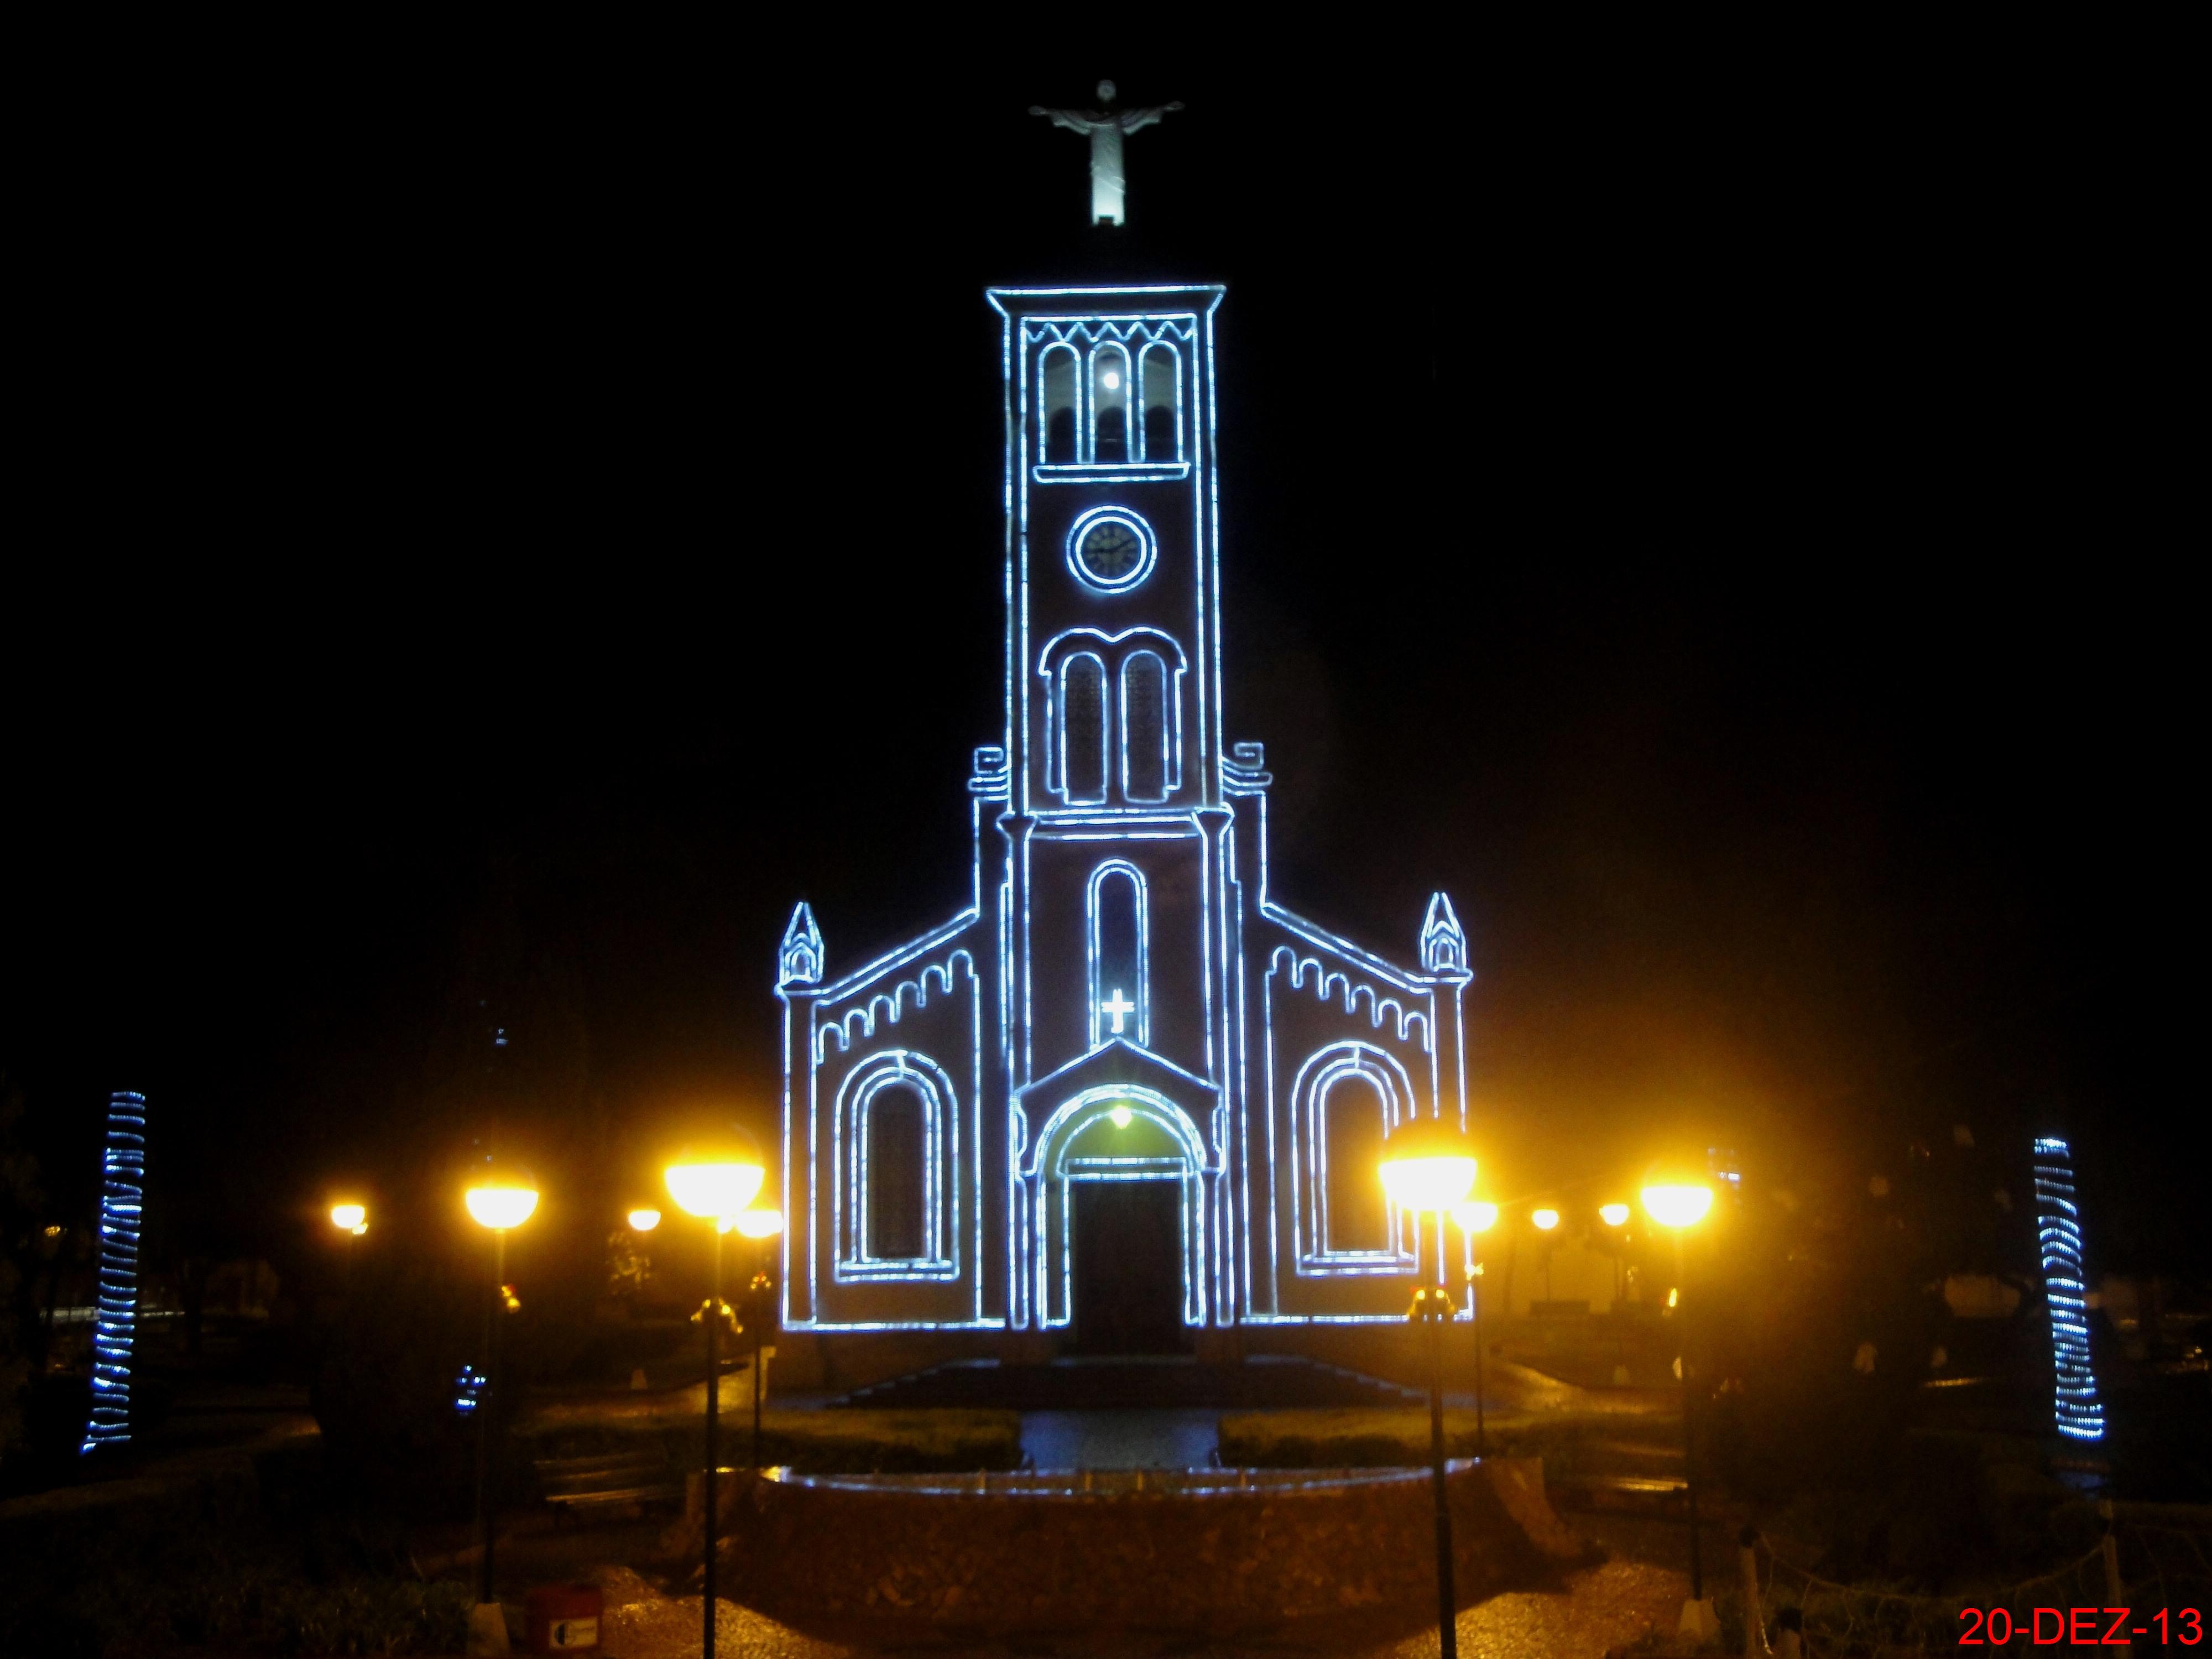 Sales Oliveira São Paulo fonte: upload.wikimedia.org